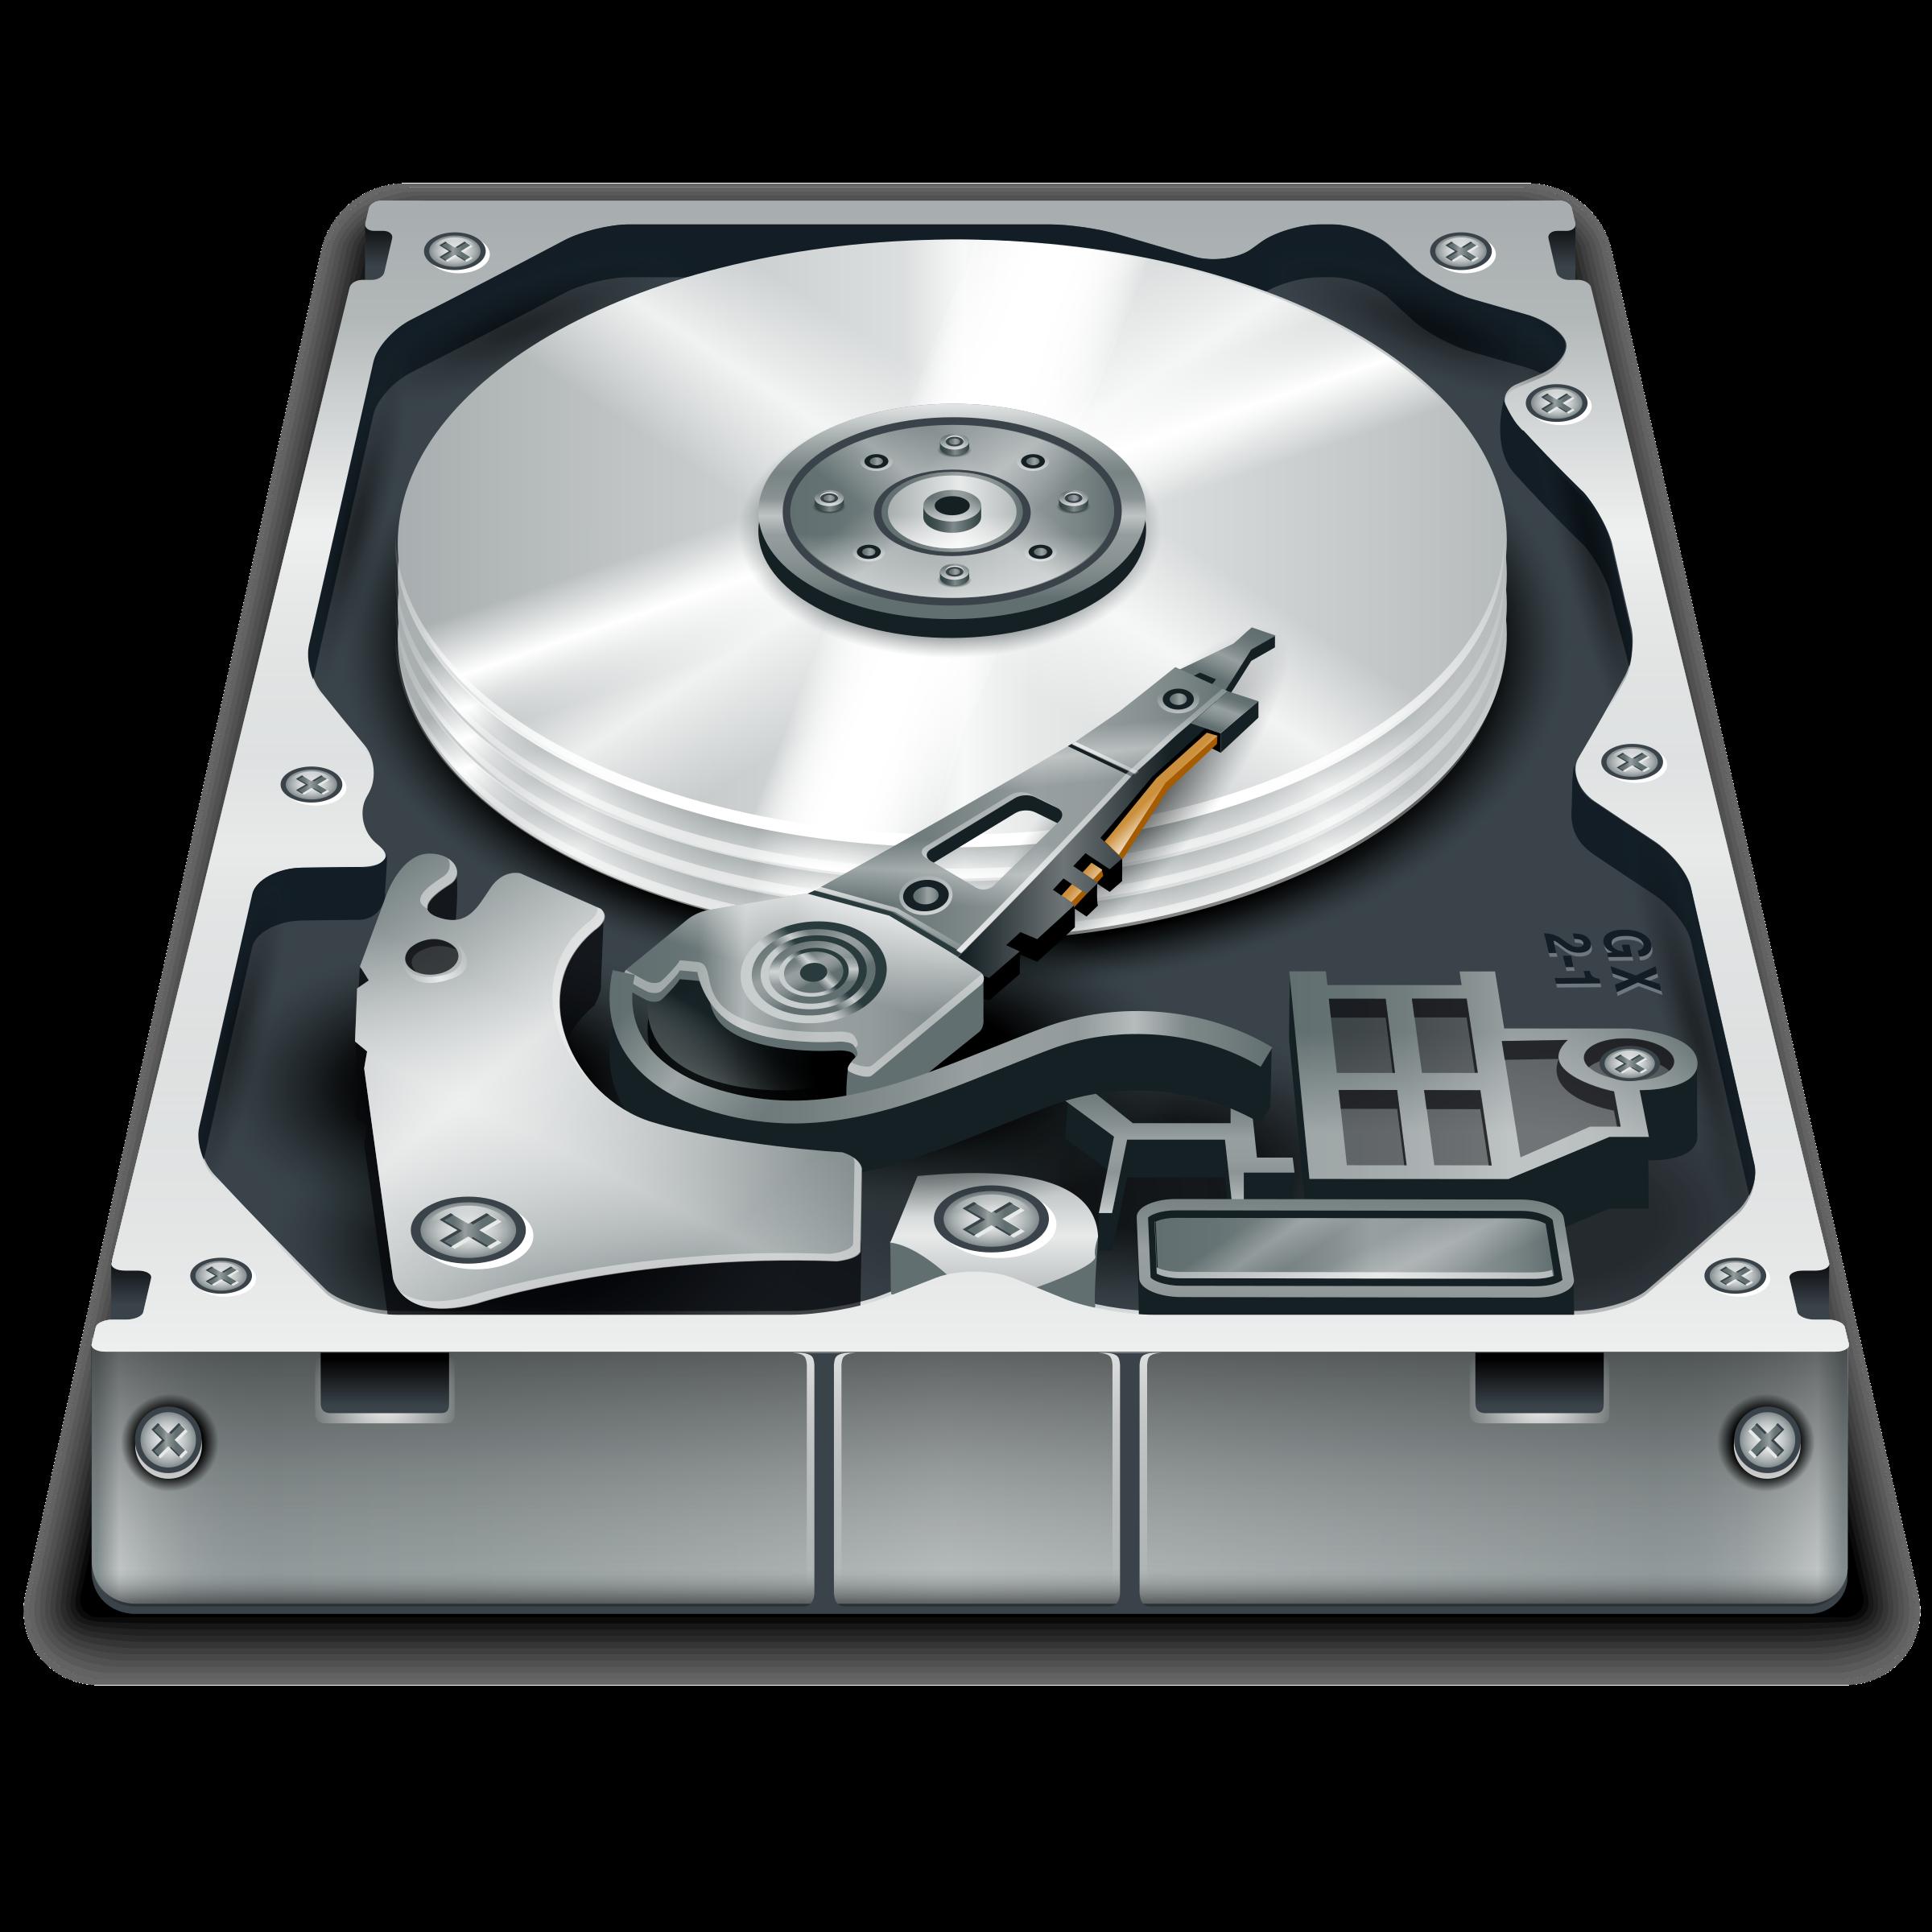 BIG IMAGE (PNG) - Harddisk HD PNG - Hard Drive PNG HD